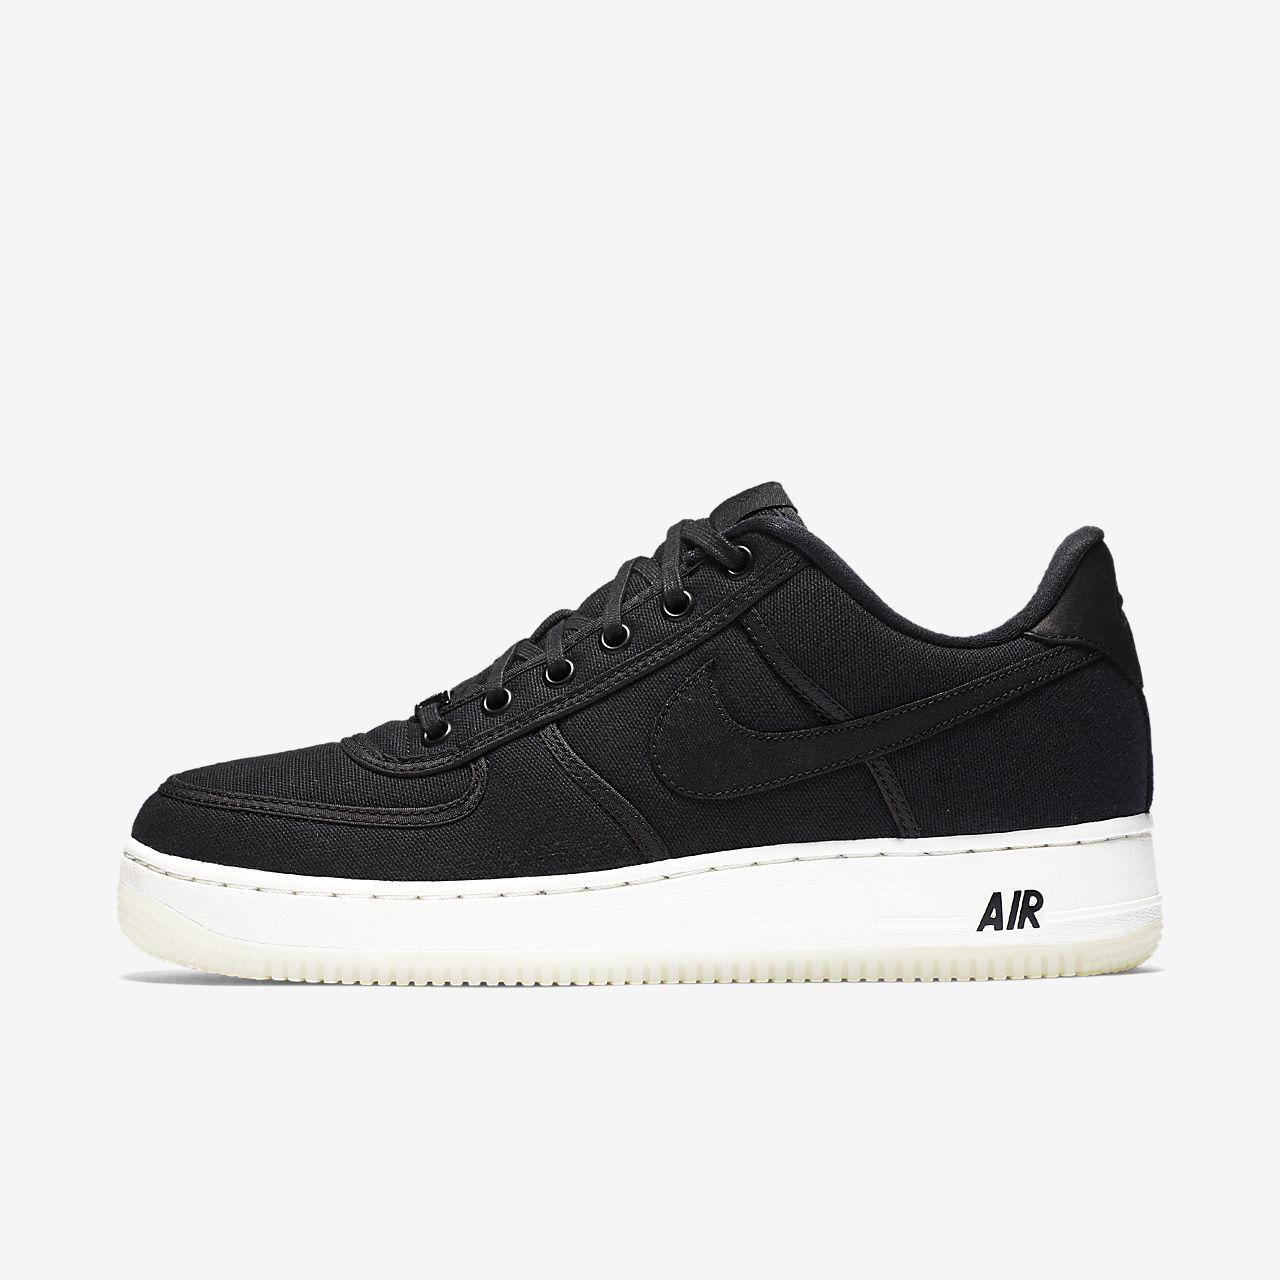 Nike Air Force 1 Low Hombre Zapatillas